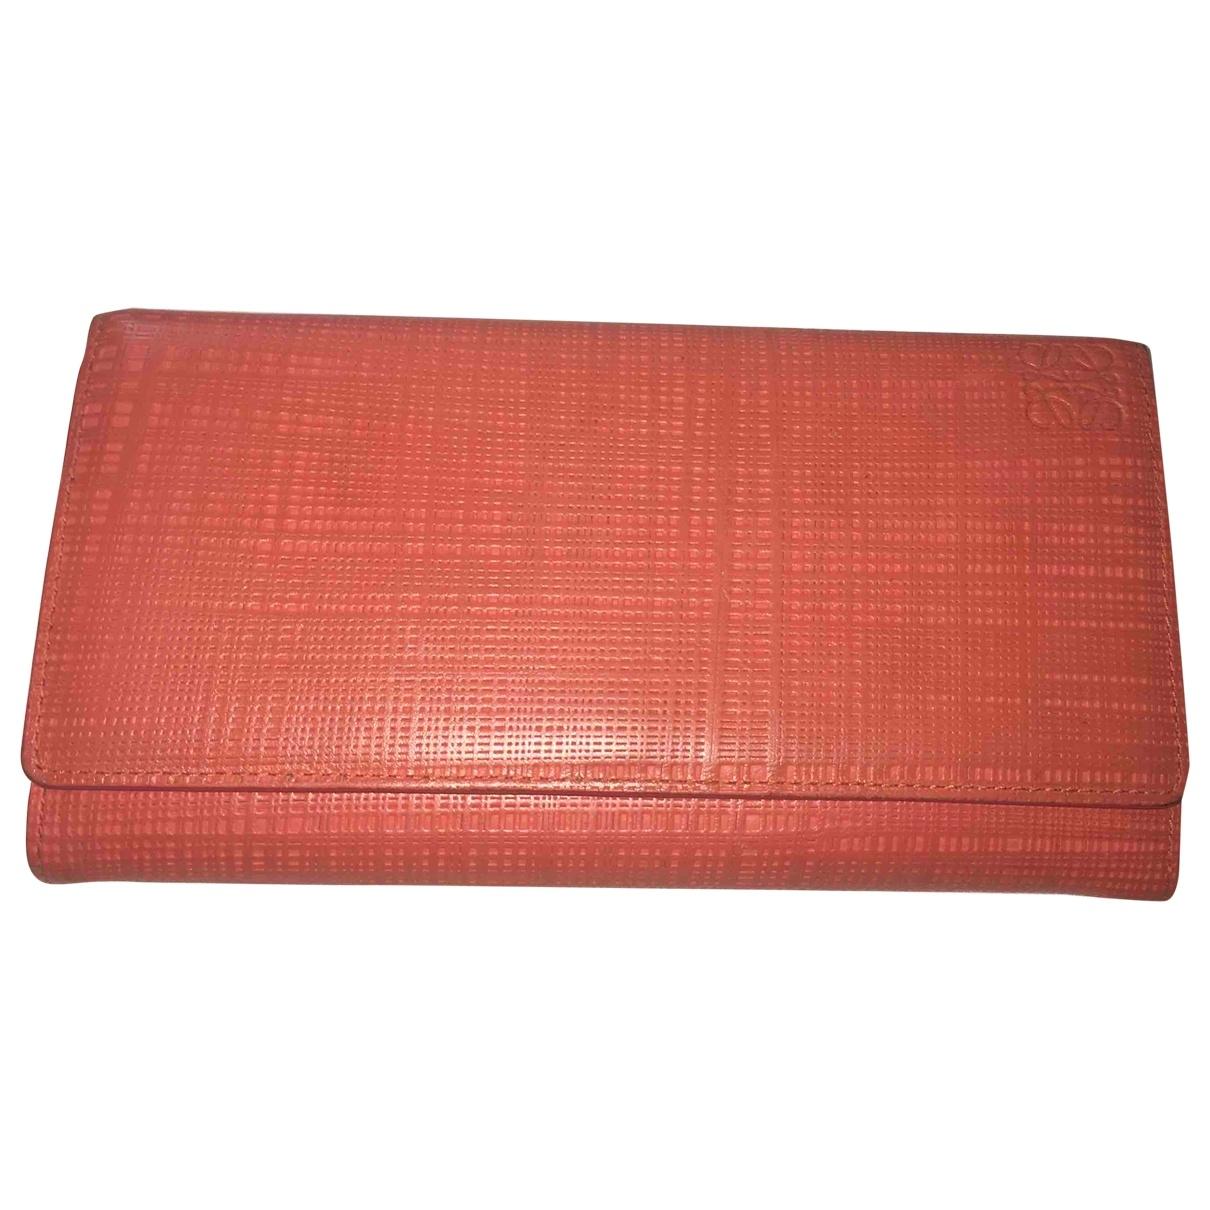 Loewe - Portefeuille   pour femme en cuir - orange